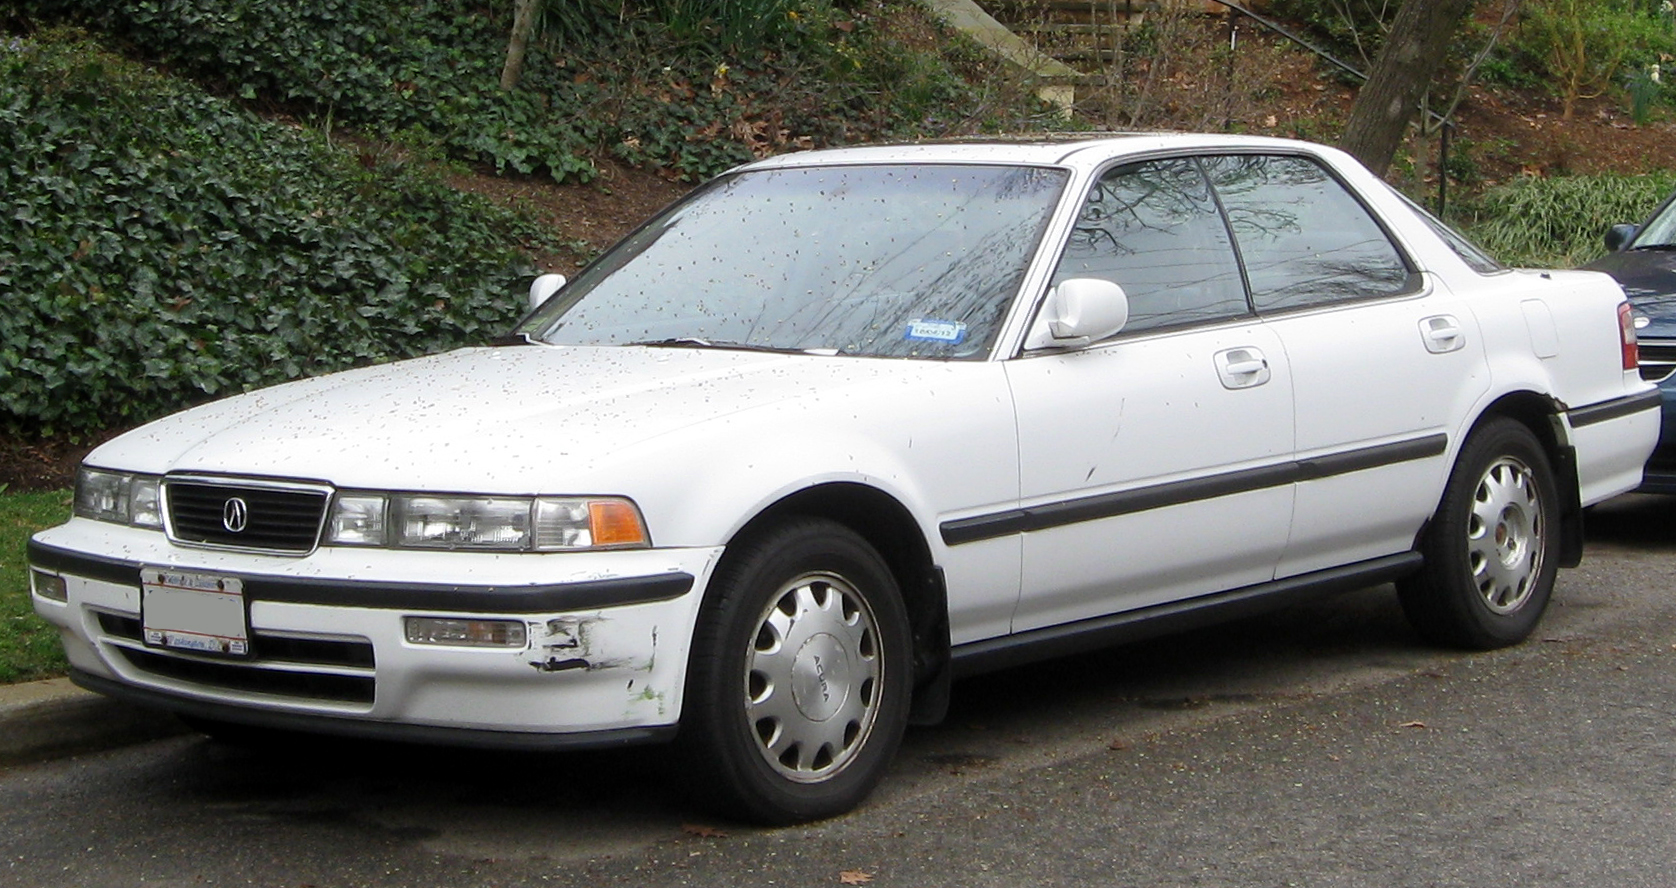 Acura Vigor on 1993 Acura Integra 4 Door